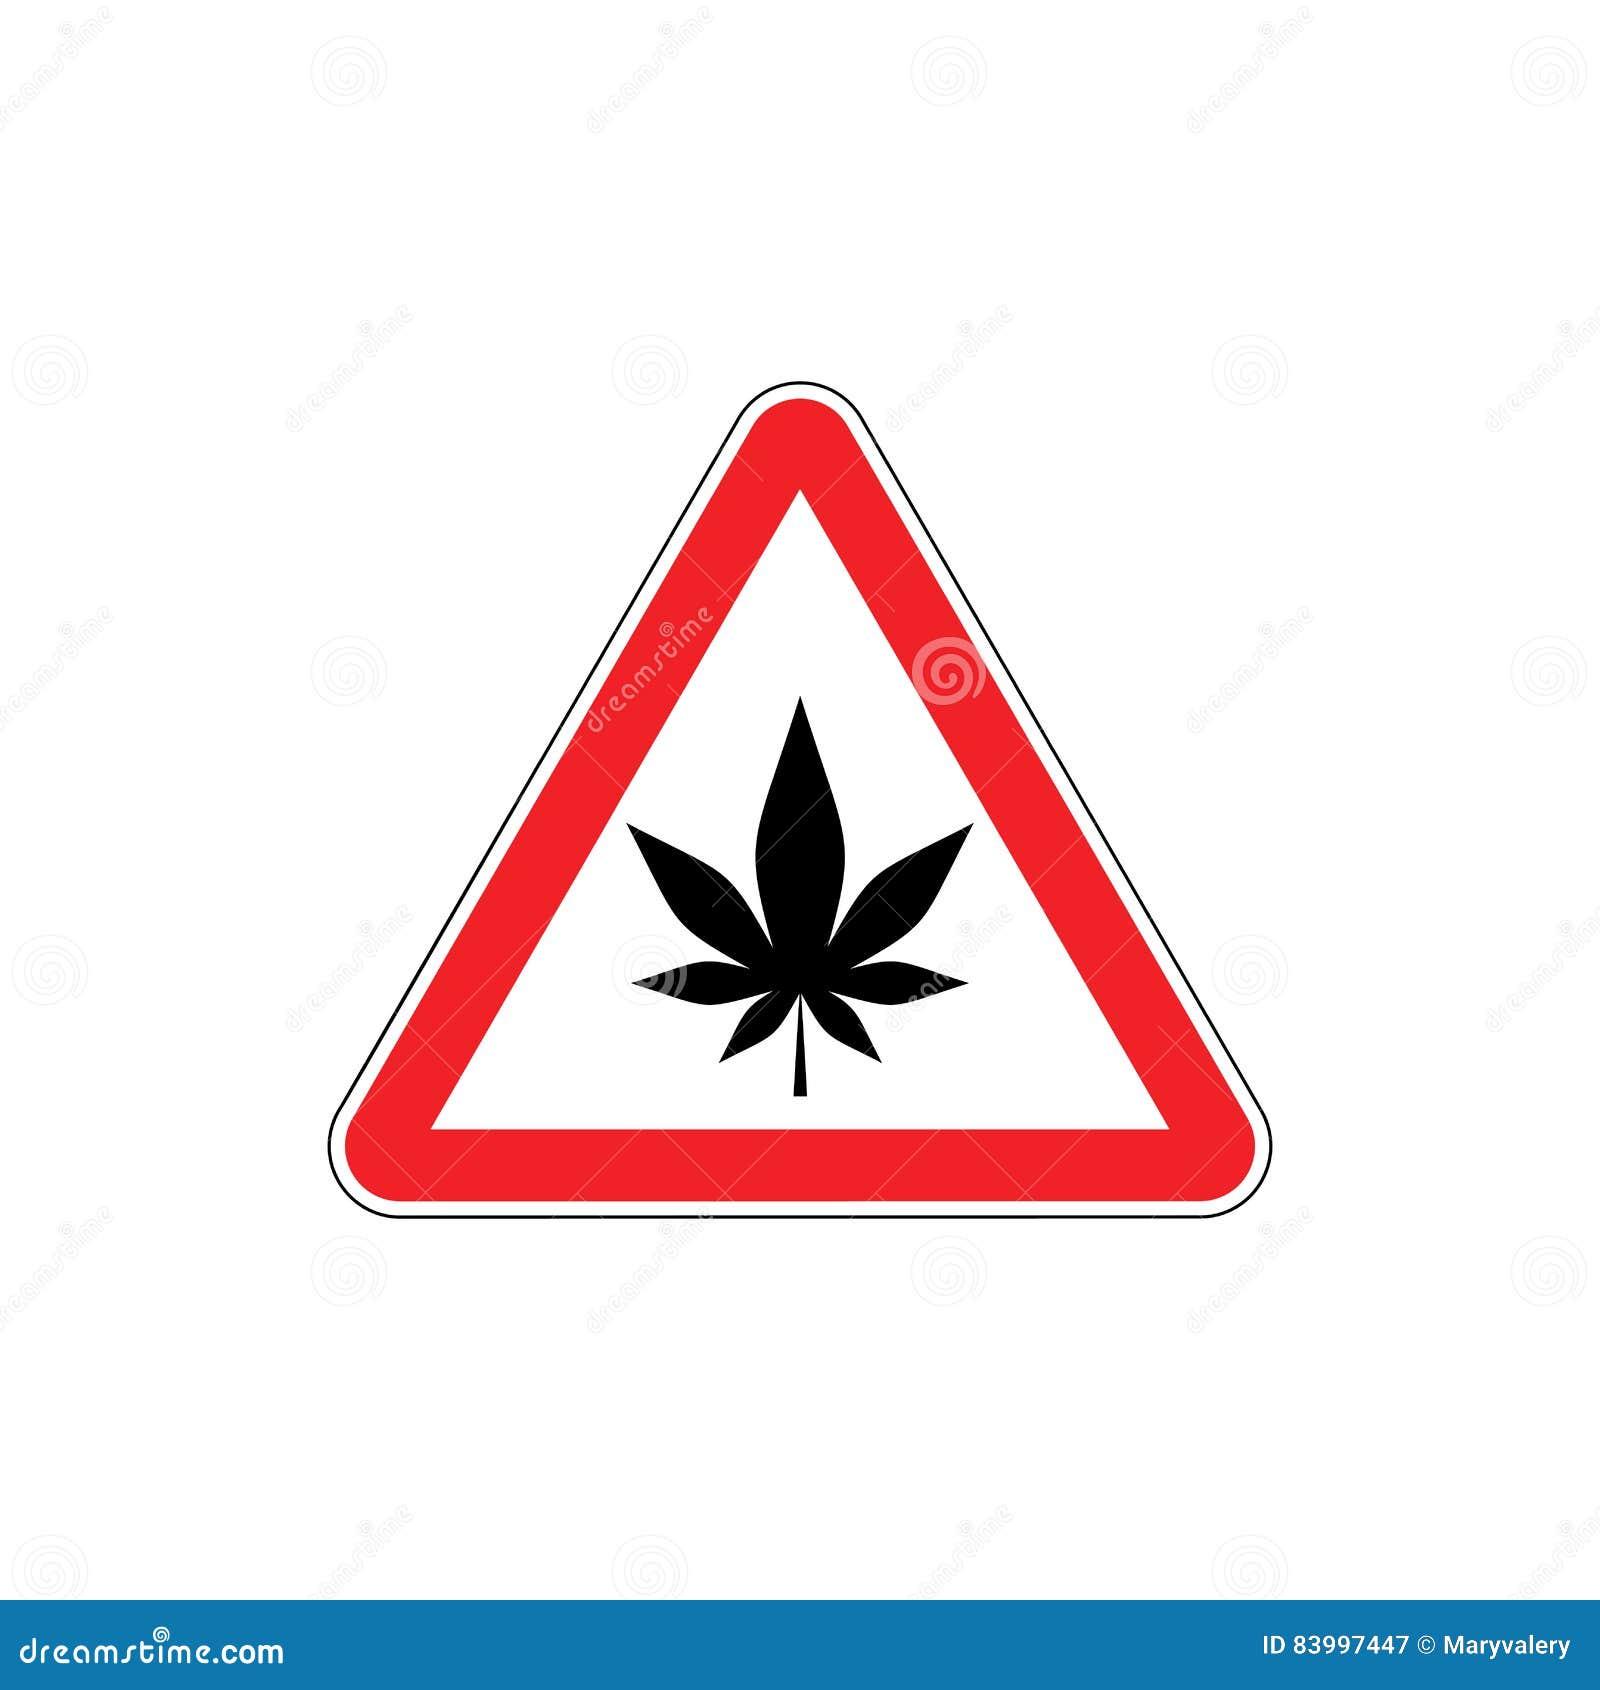 marijuana and the misconception on the dangers of marijuana Opponents of the legalization of marijuana argue that marijuana is a gateway drug, more dangerous than  another misconception is that marijuana is more dangerous.